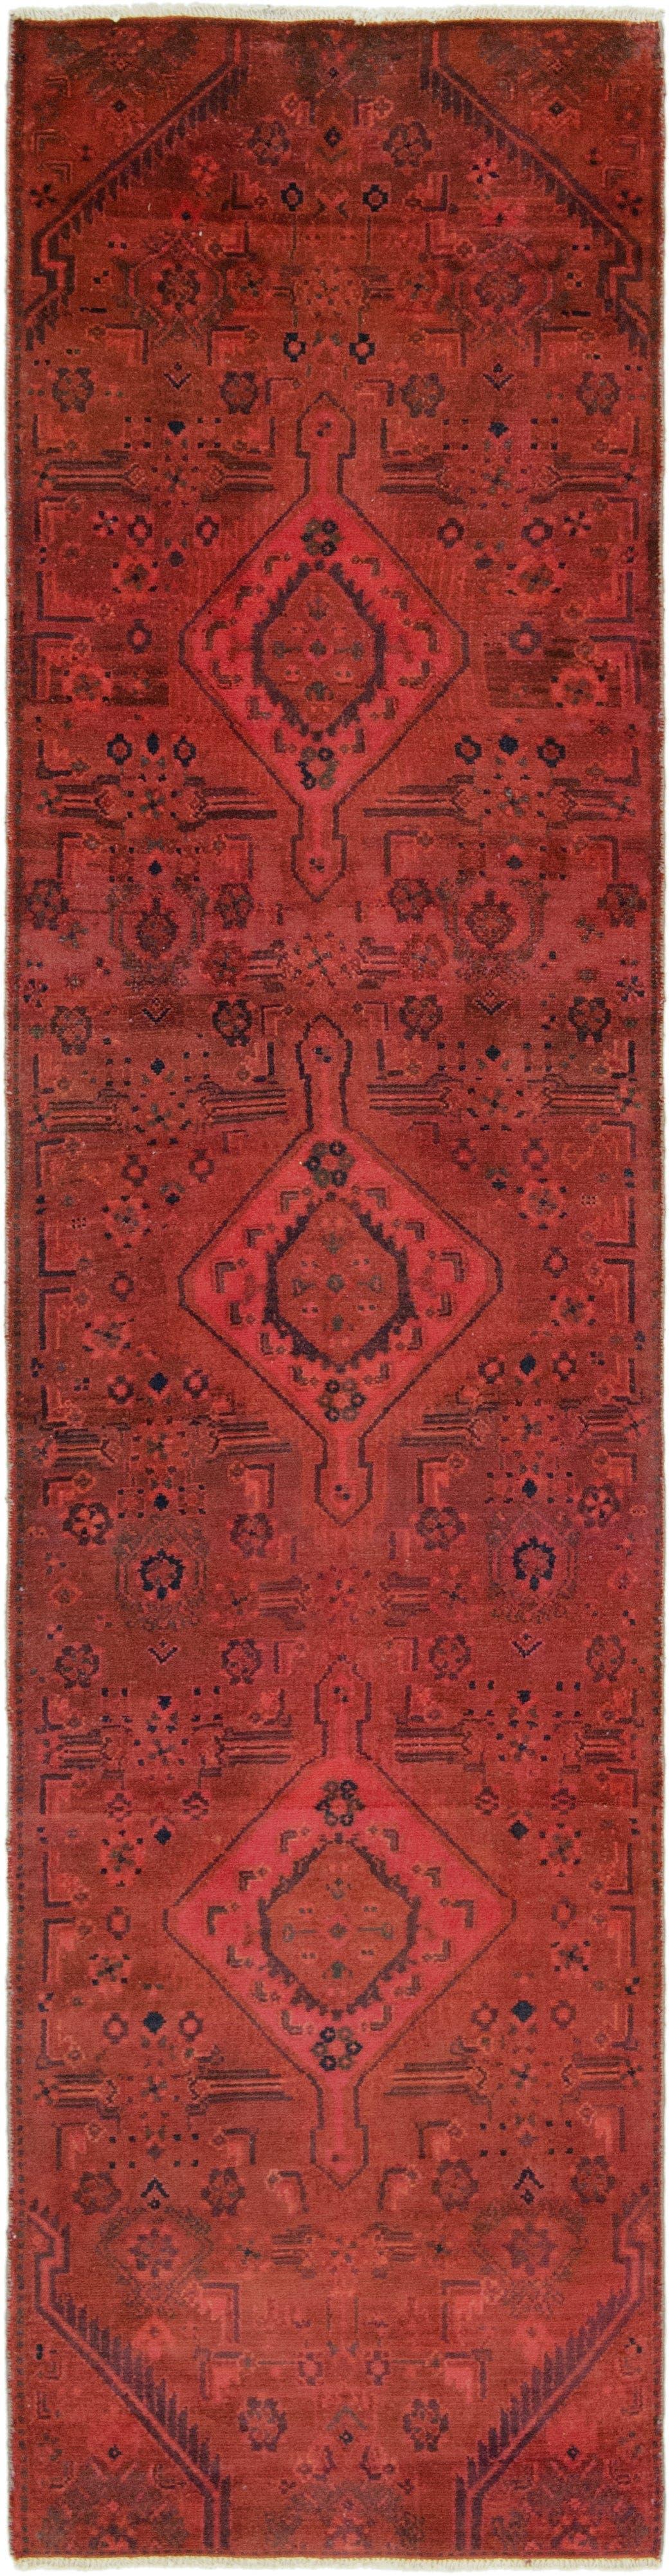 3' 4 x 5' 8 Ultra Vintage Persian Rug main image